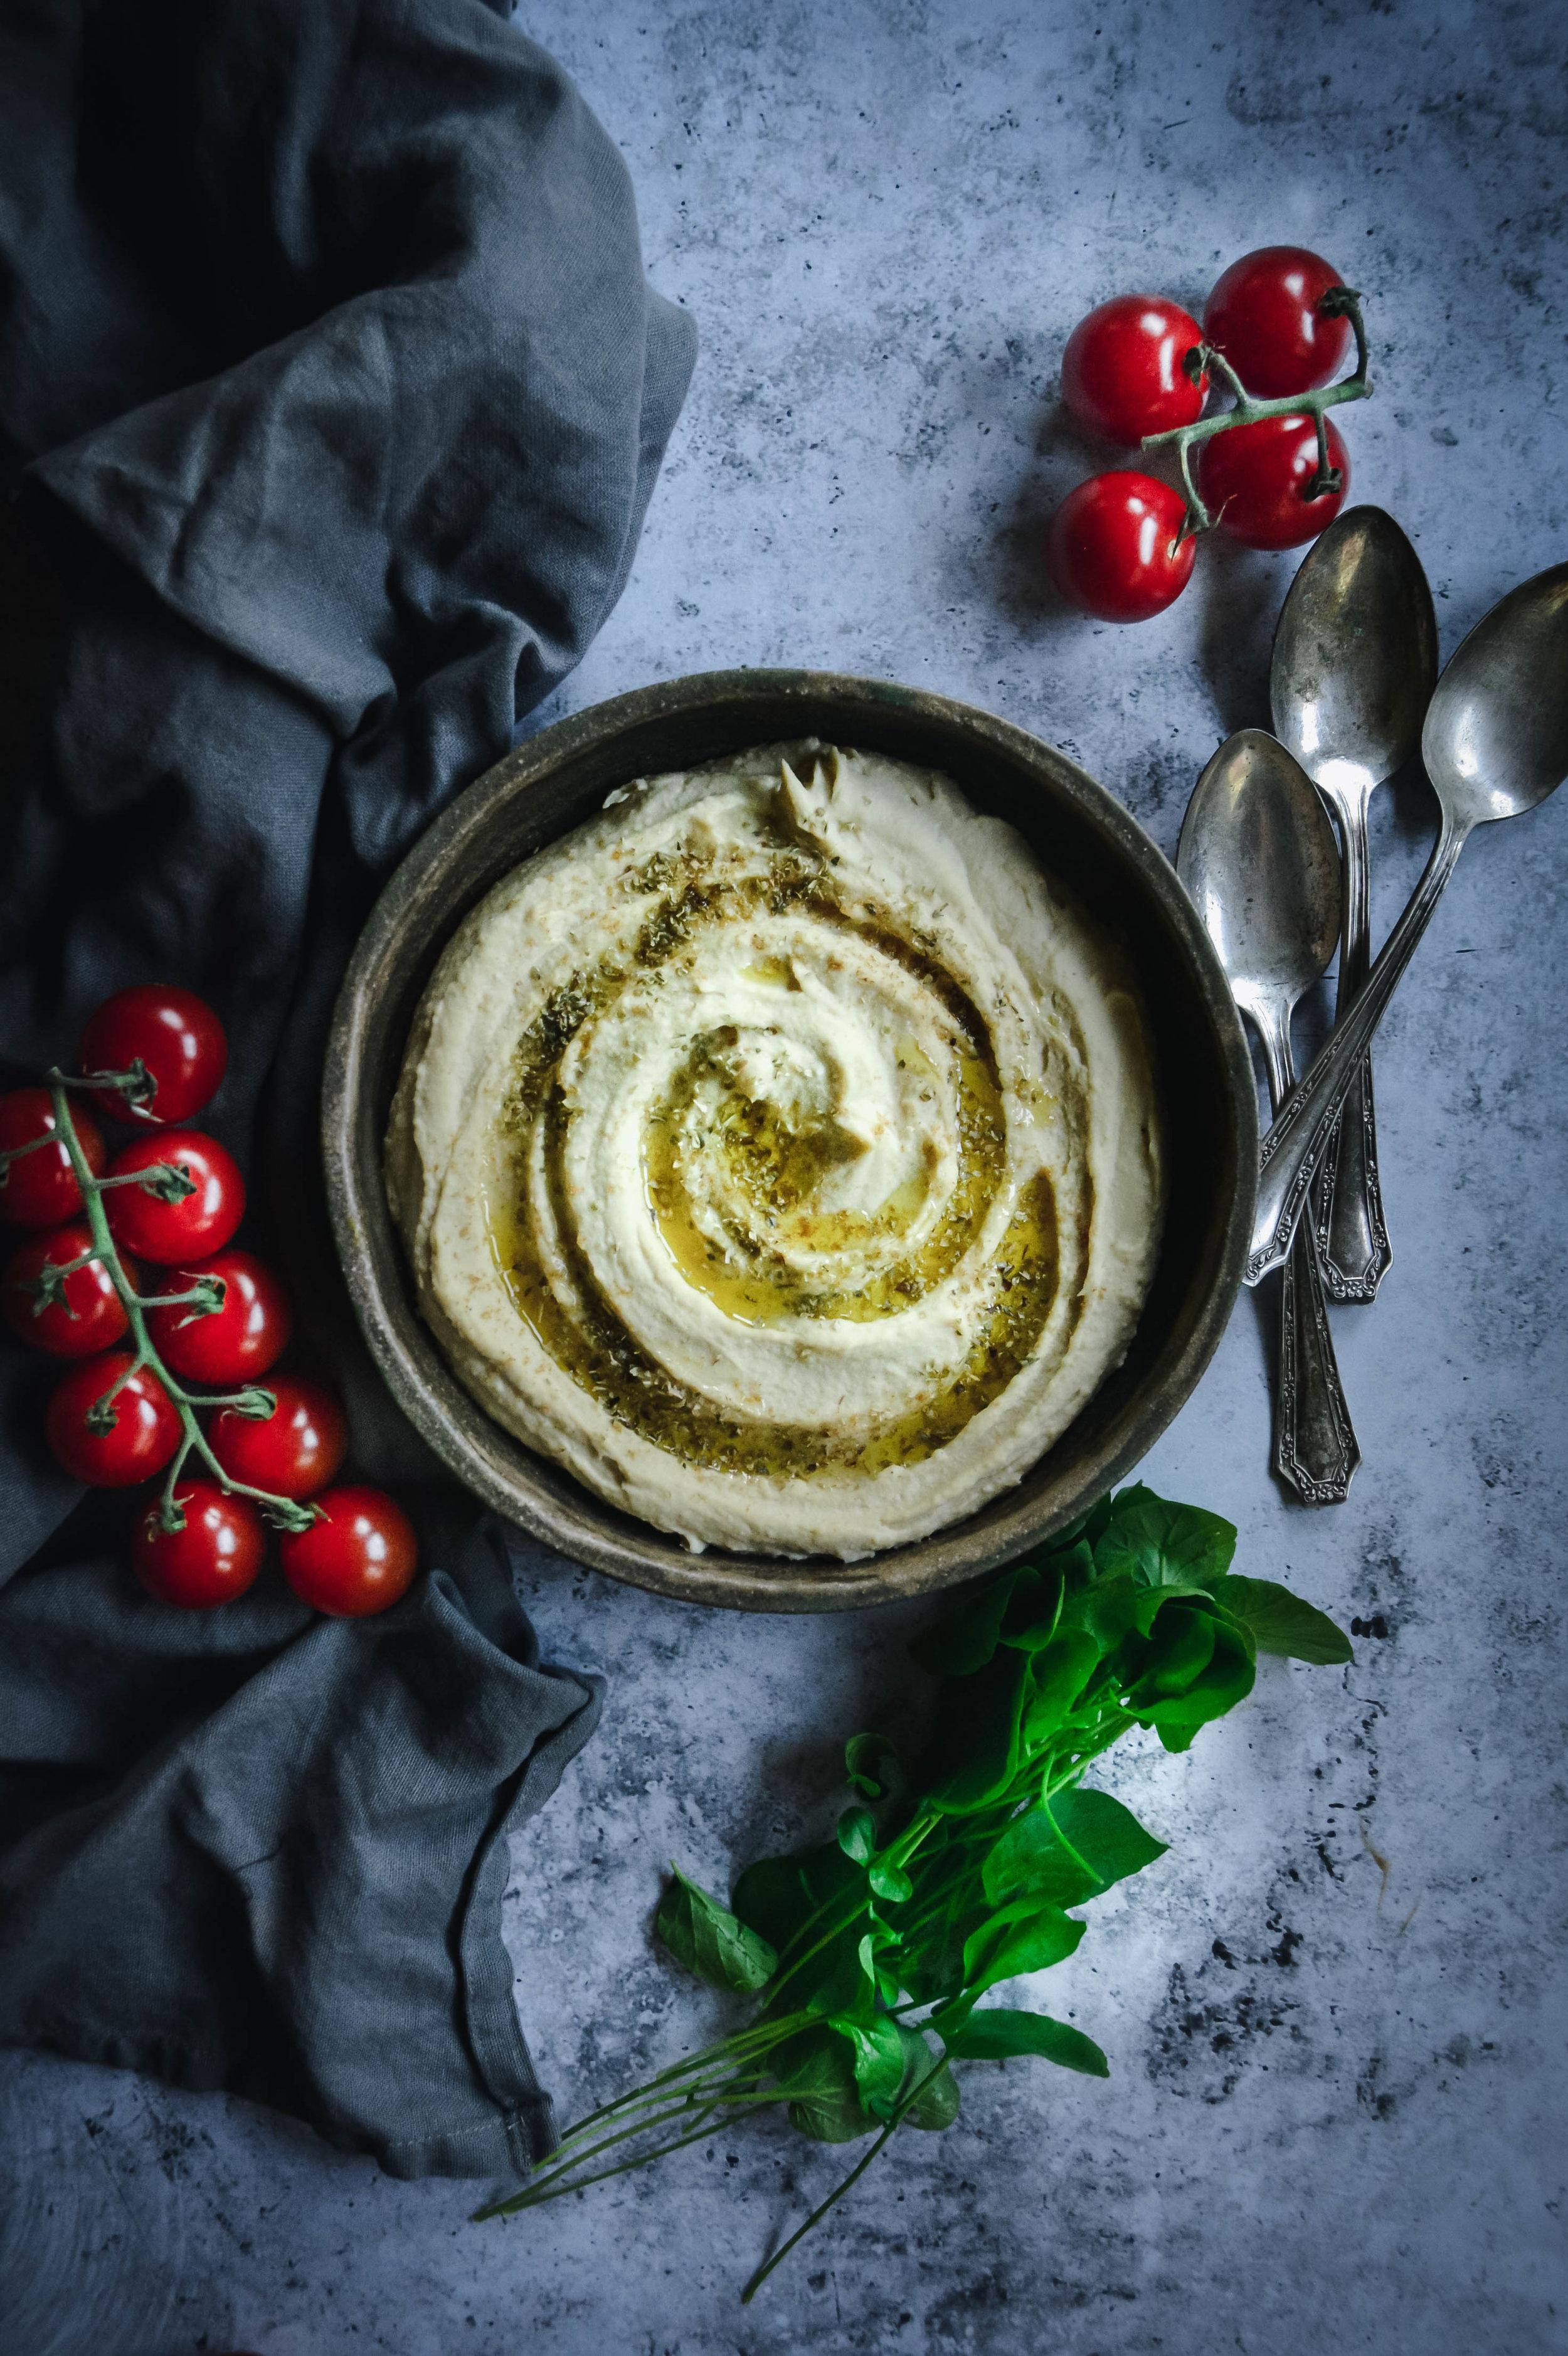 hummus and tomatoes